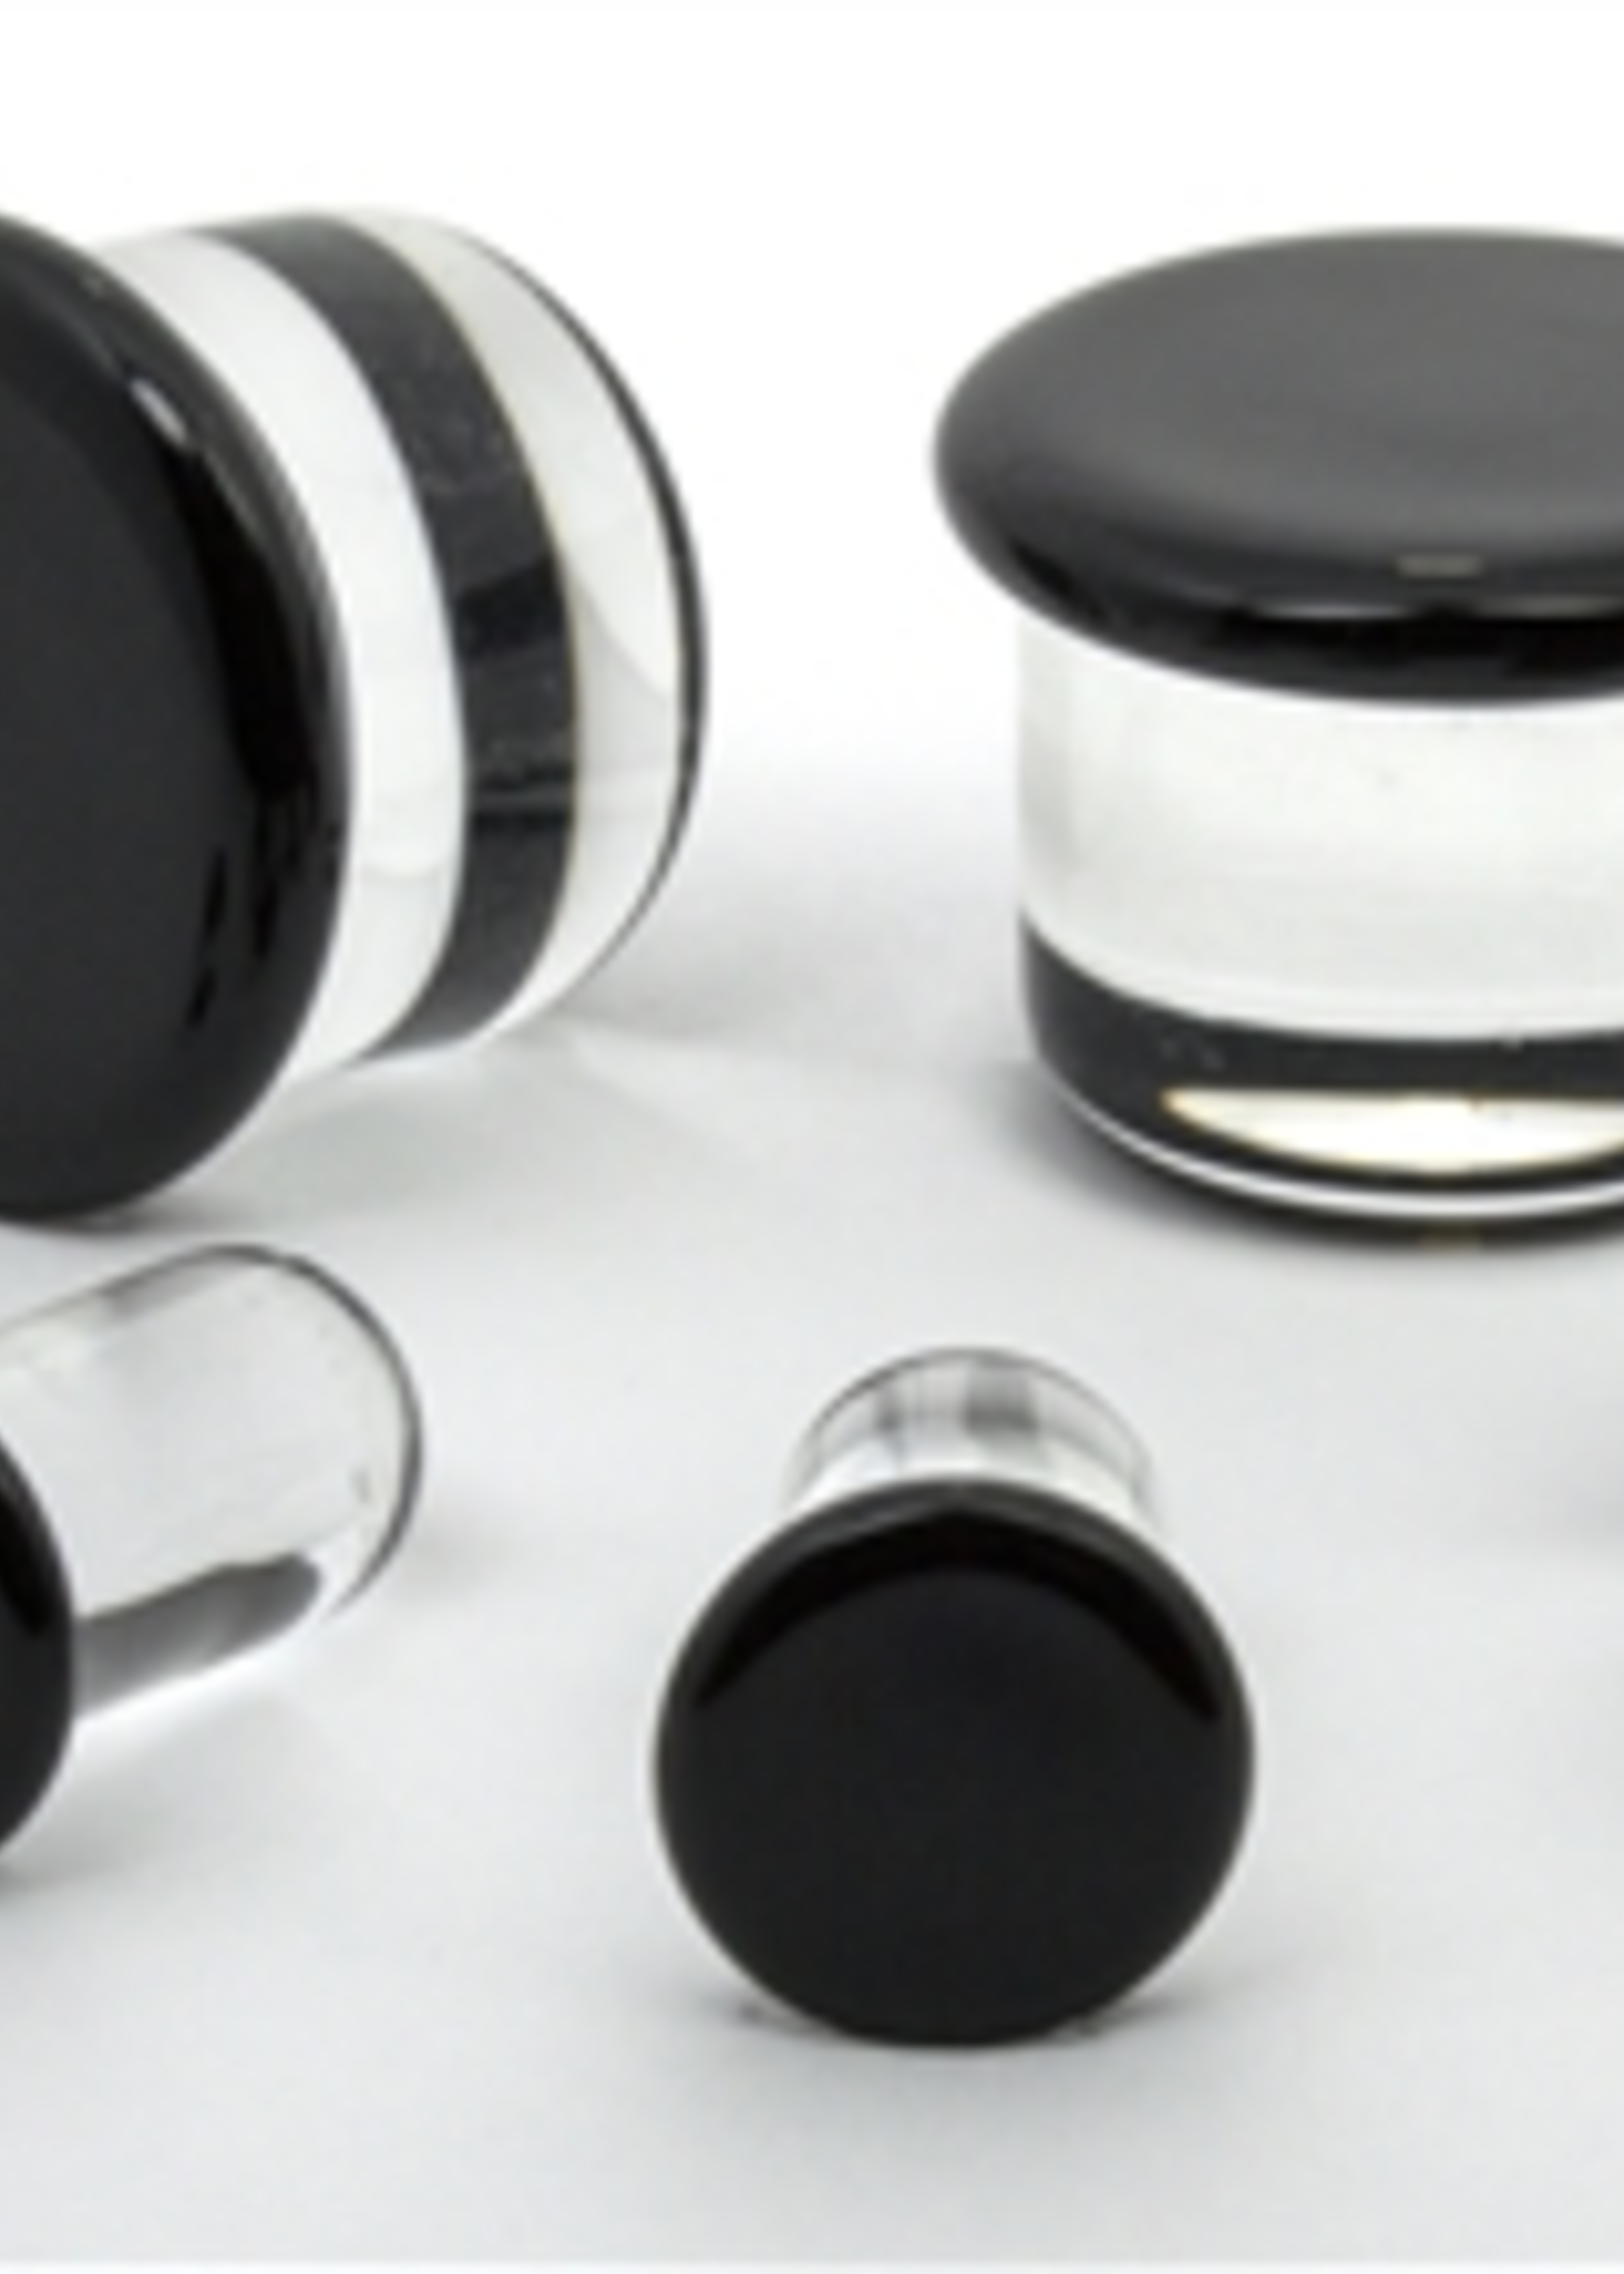 4.5mm Half Size SF Glass Plugs